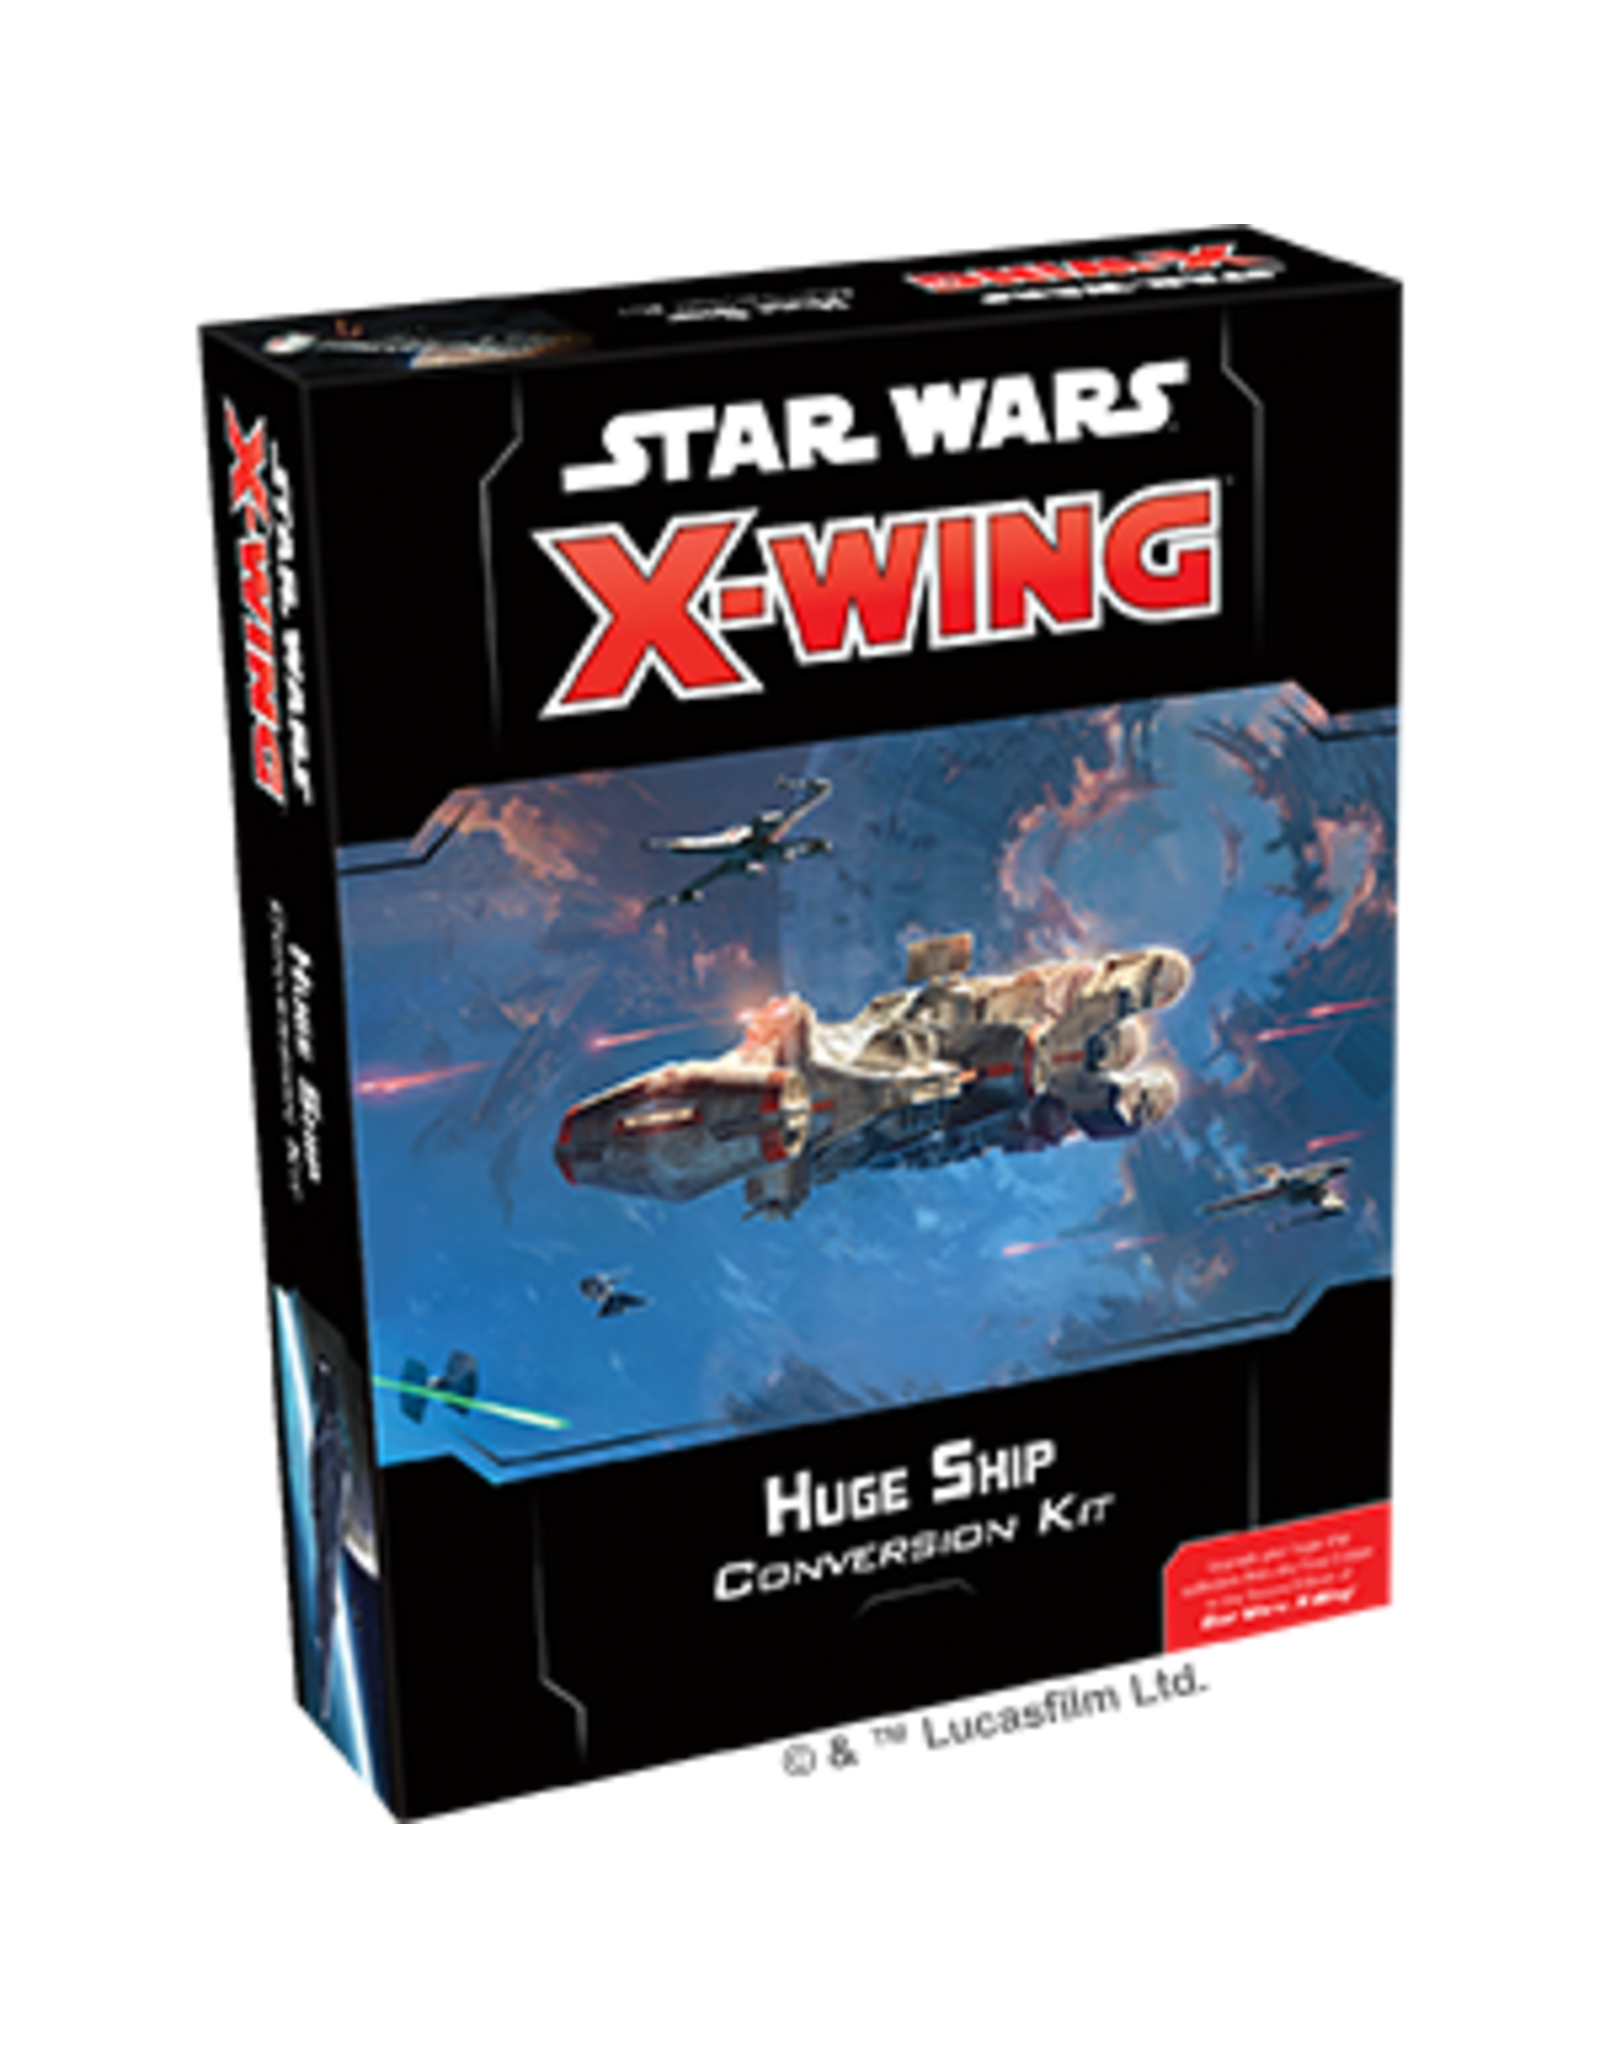 Fantasy Flight Games Star Wars X-Wing 2nd Edition: Huge Ship Conversion Expansion Kit